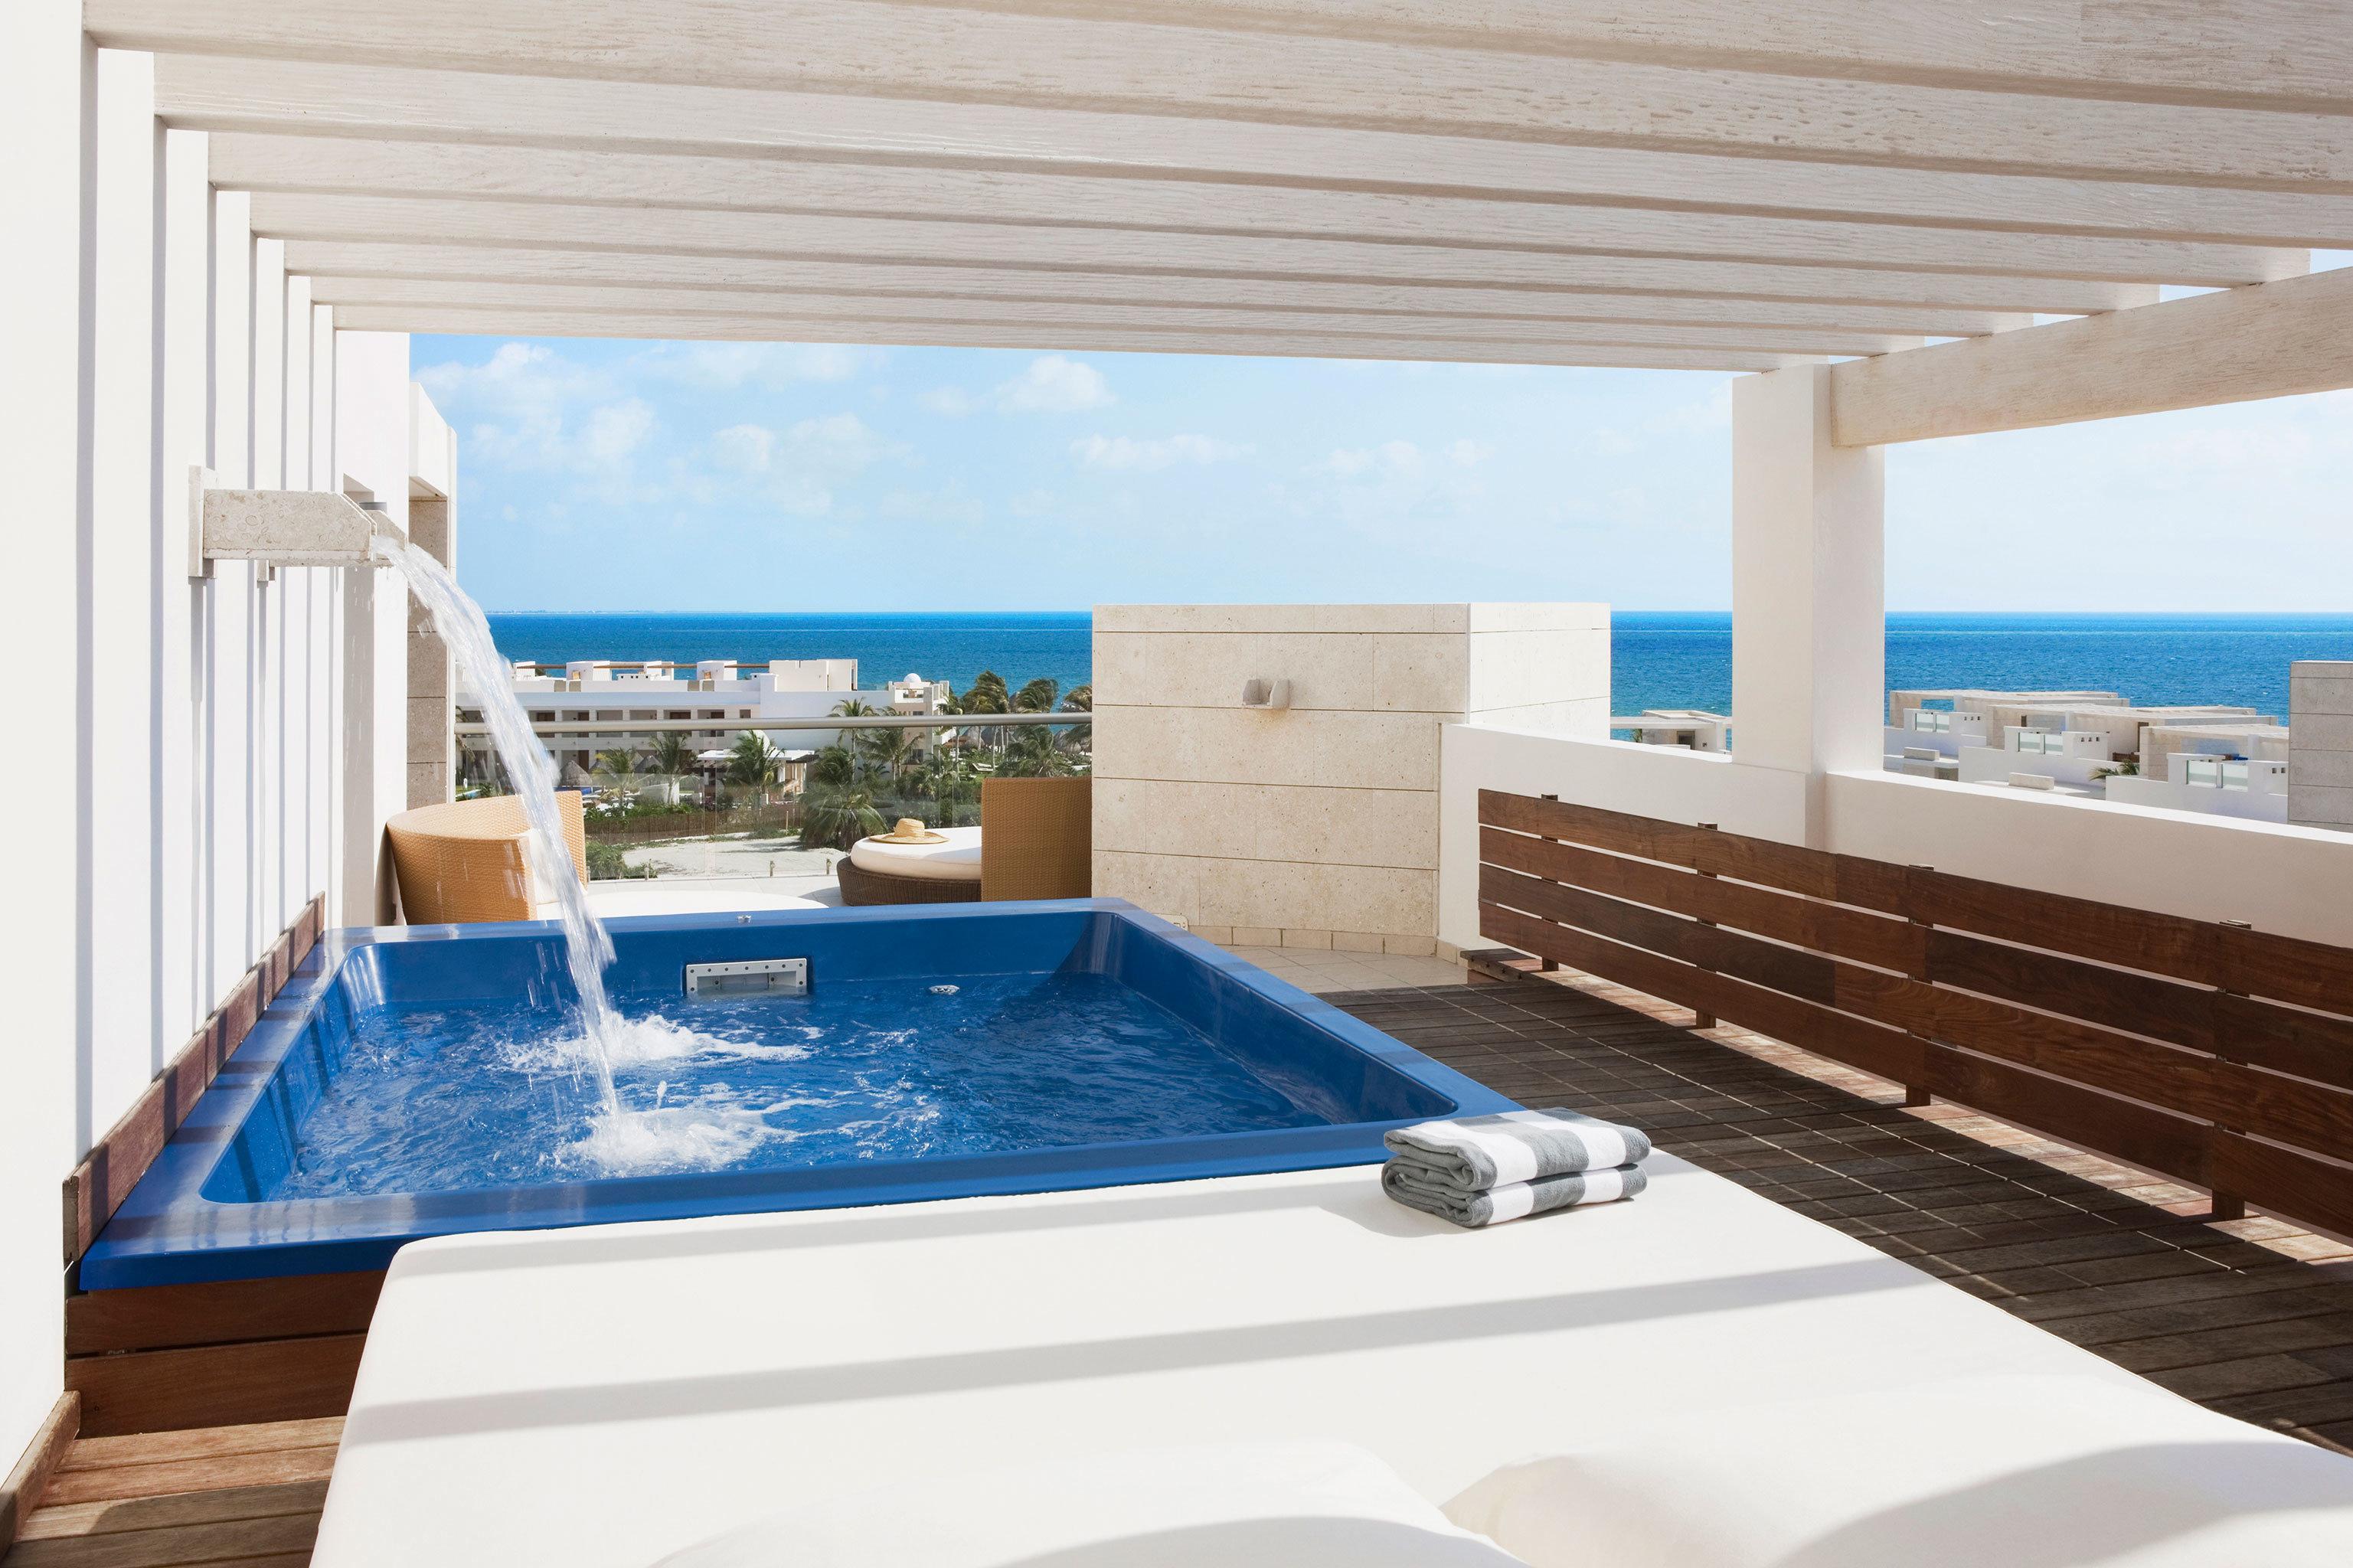 Hot tub Hot tub/Jacuzzi Luxury Modern Tropical Wellness swimming pool property jacuzzi Villa Suite blue Deck Resort